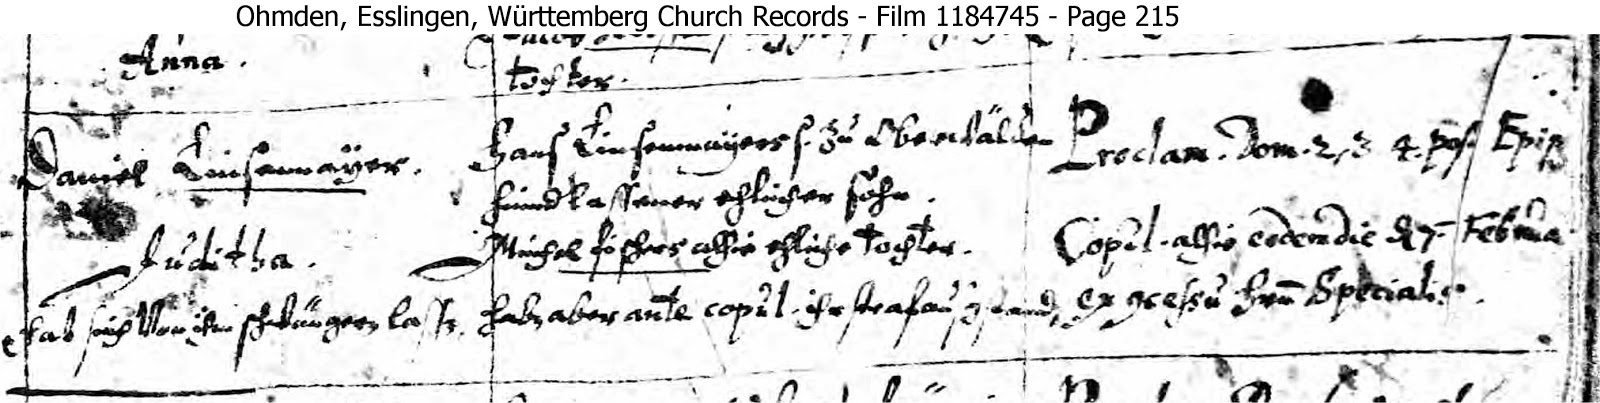 Len Esslingen matt s genealogy ancestors of magdalena and